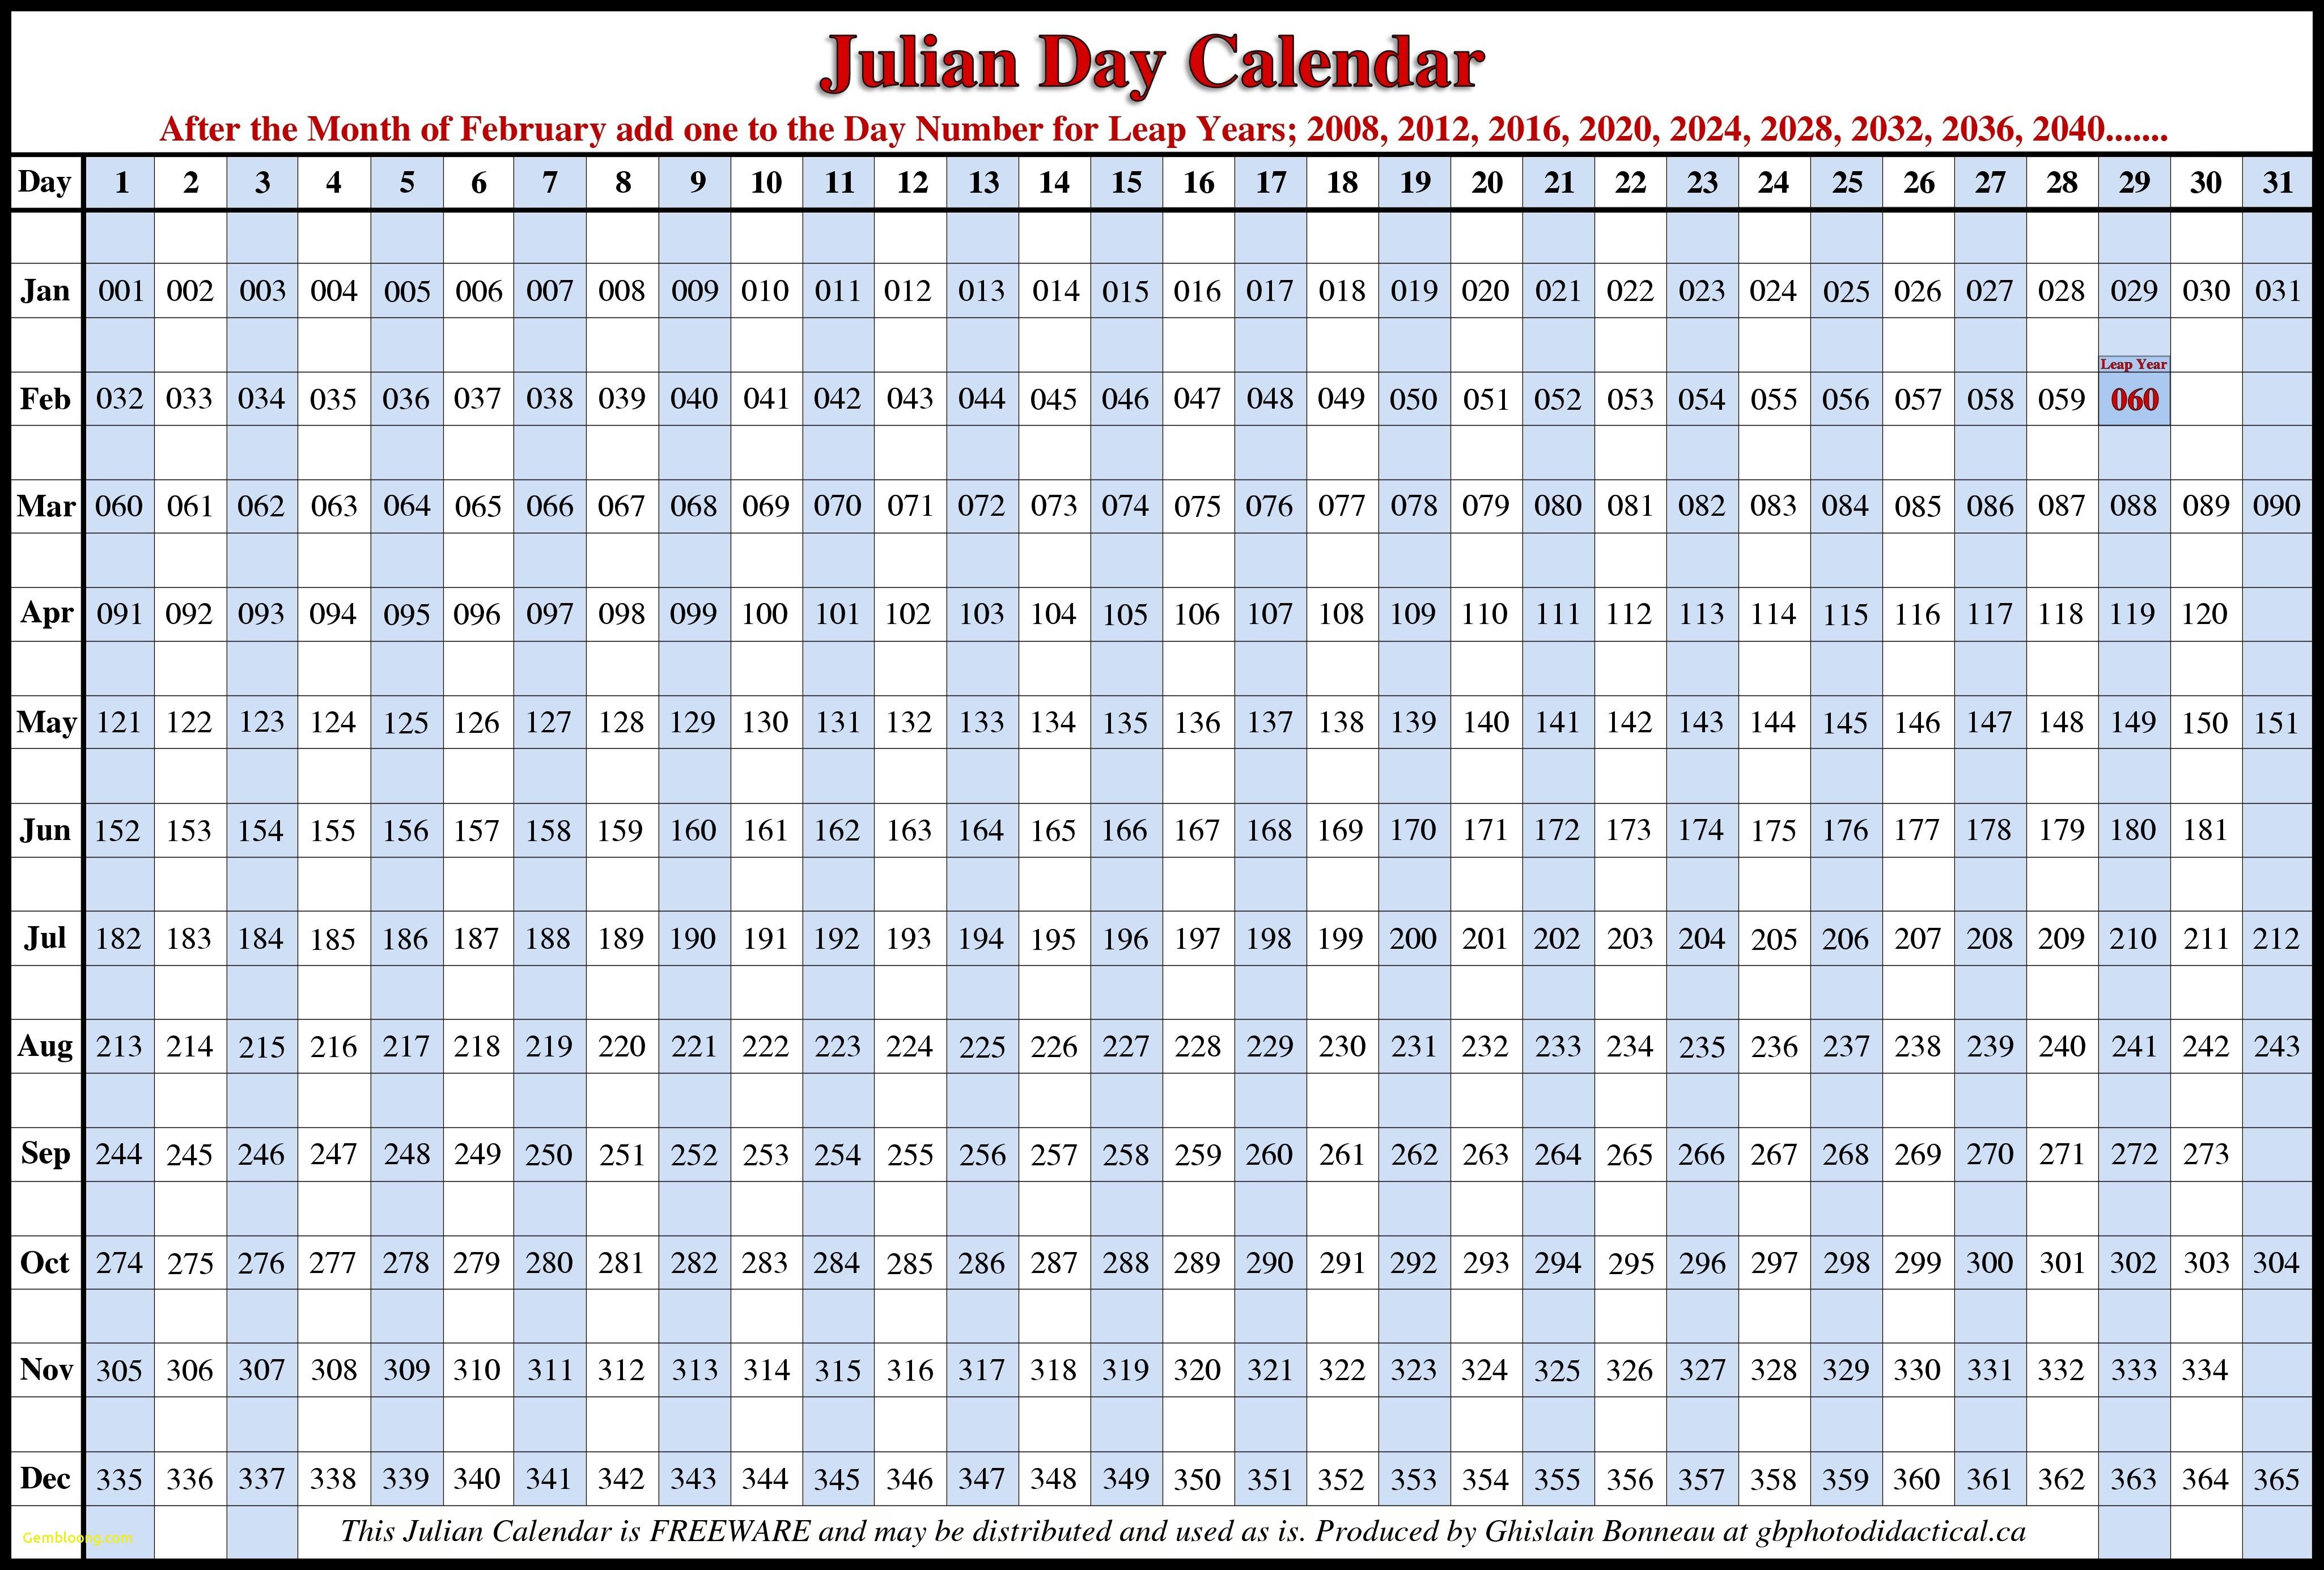 Depo Shot Calender July 2018 - December 2018 | Calendar Template